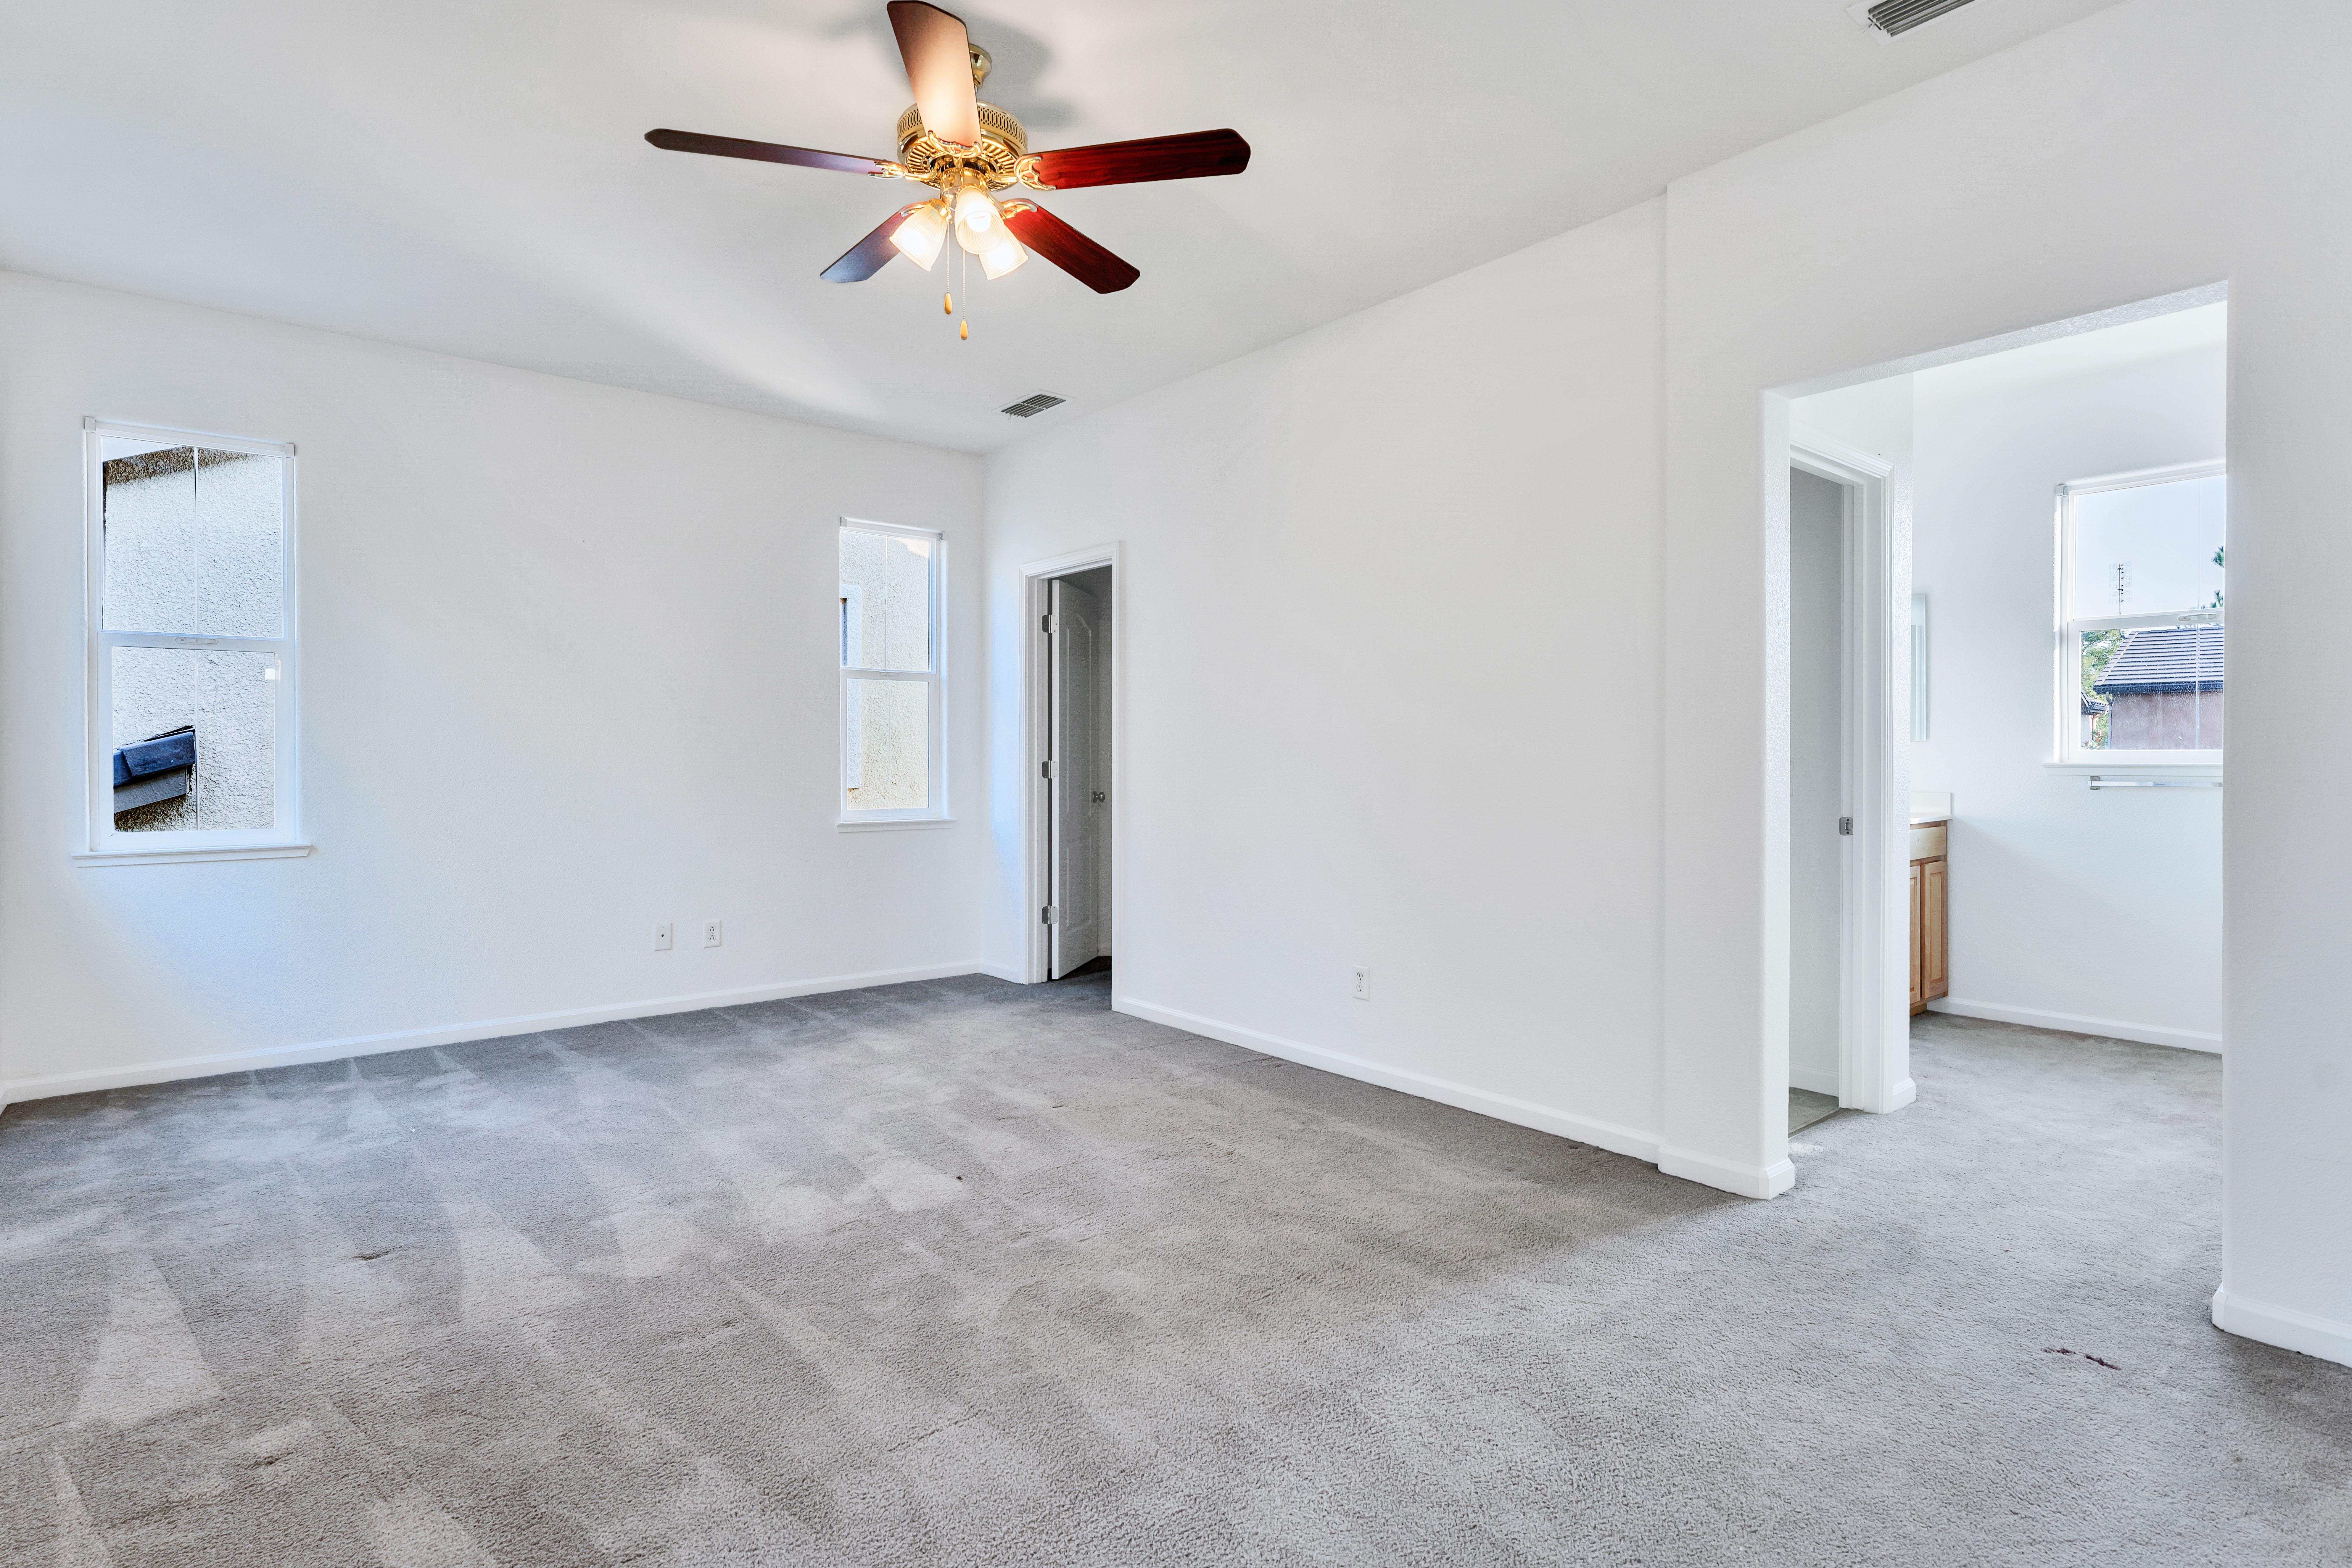 Master Bedroom of 17 Narwal Place, Sacramento, Ca 95835